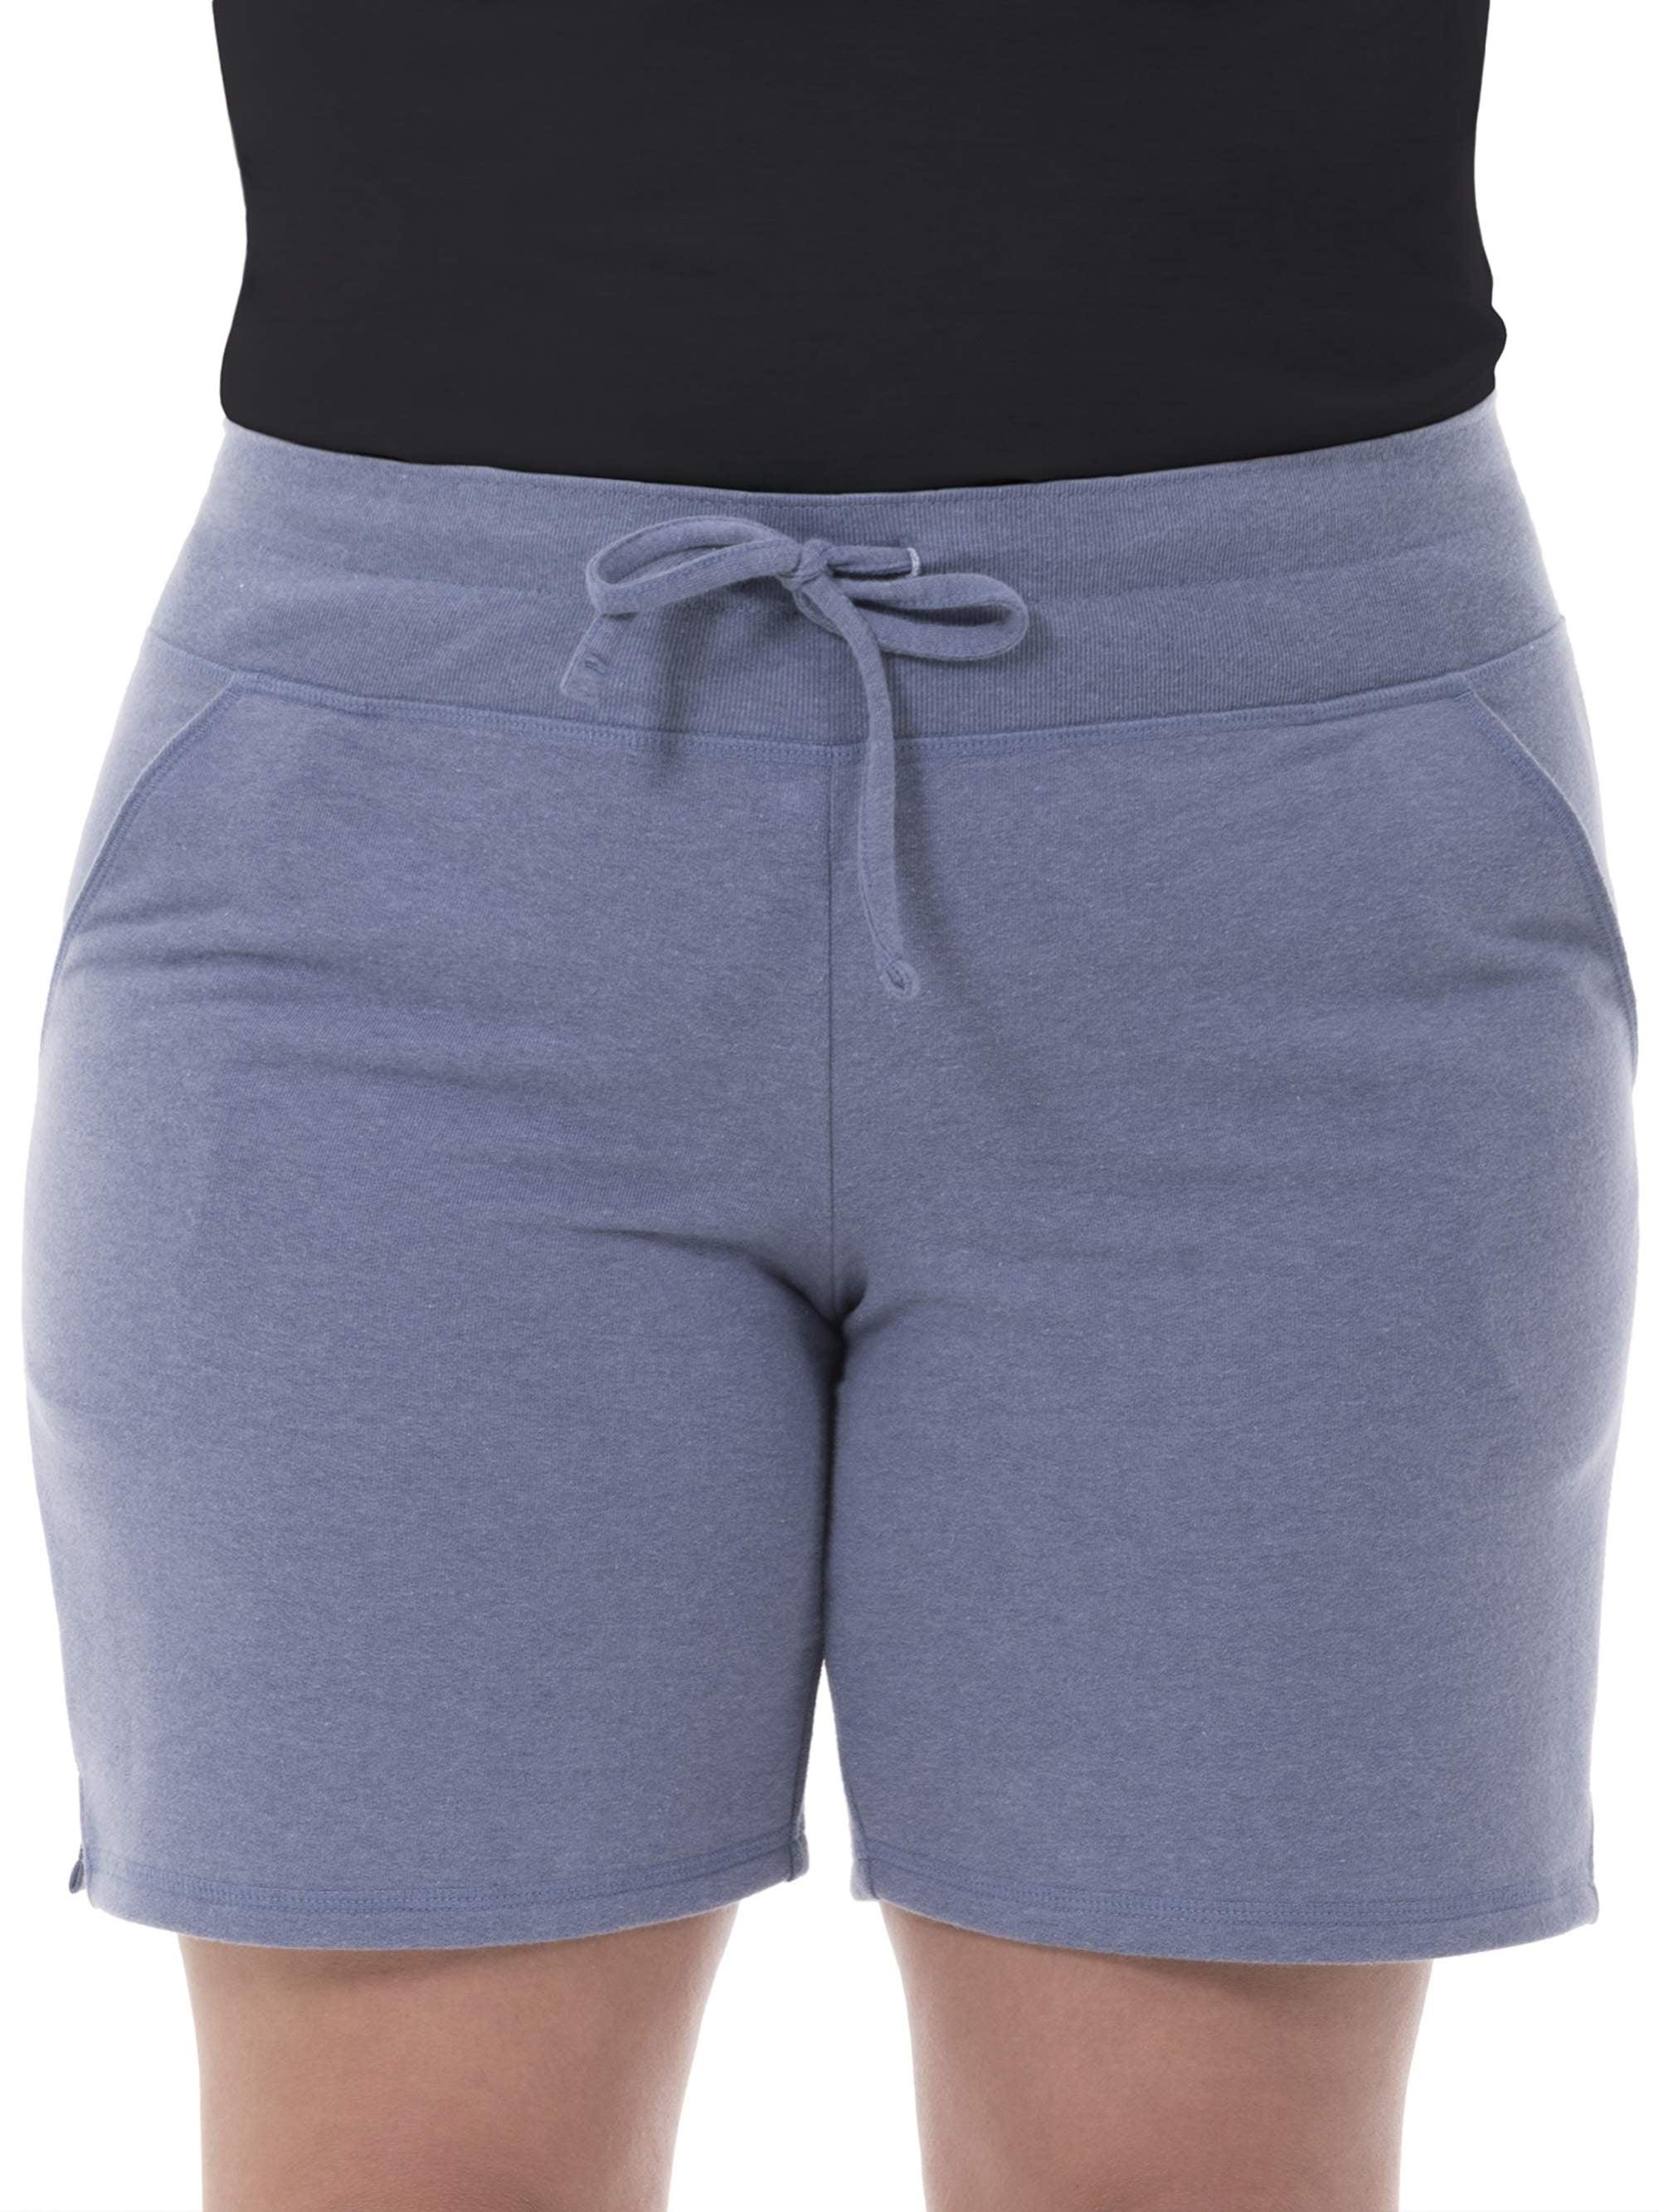 Women's Plus-Size Bermuda Short